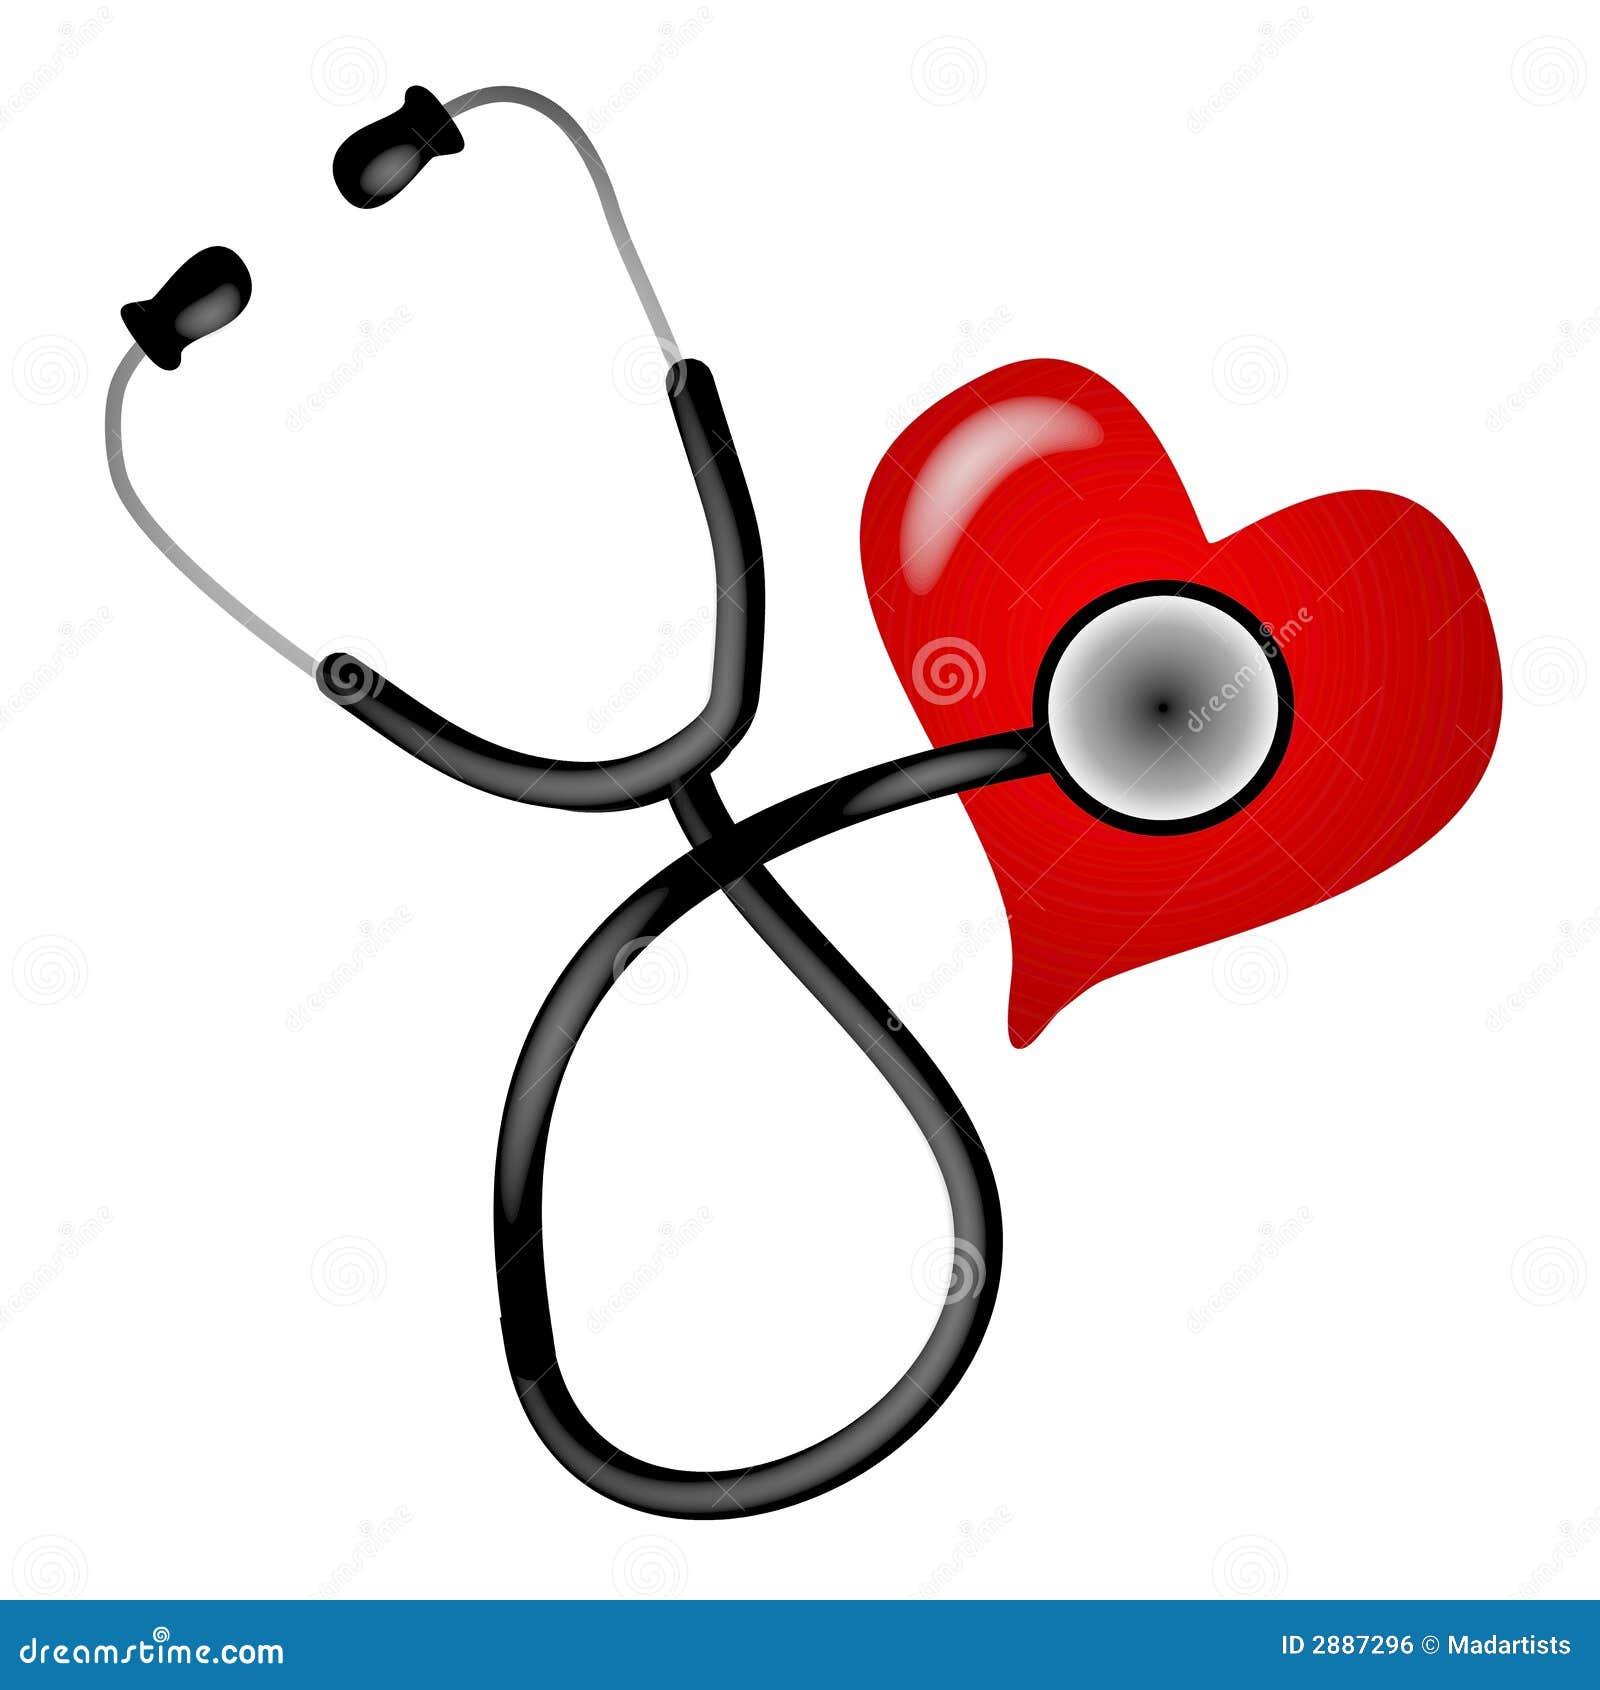 Stethoscope Heart Illustration Stock Illustration ... Doctor Stethoscope Graphic